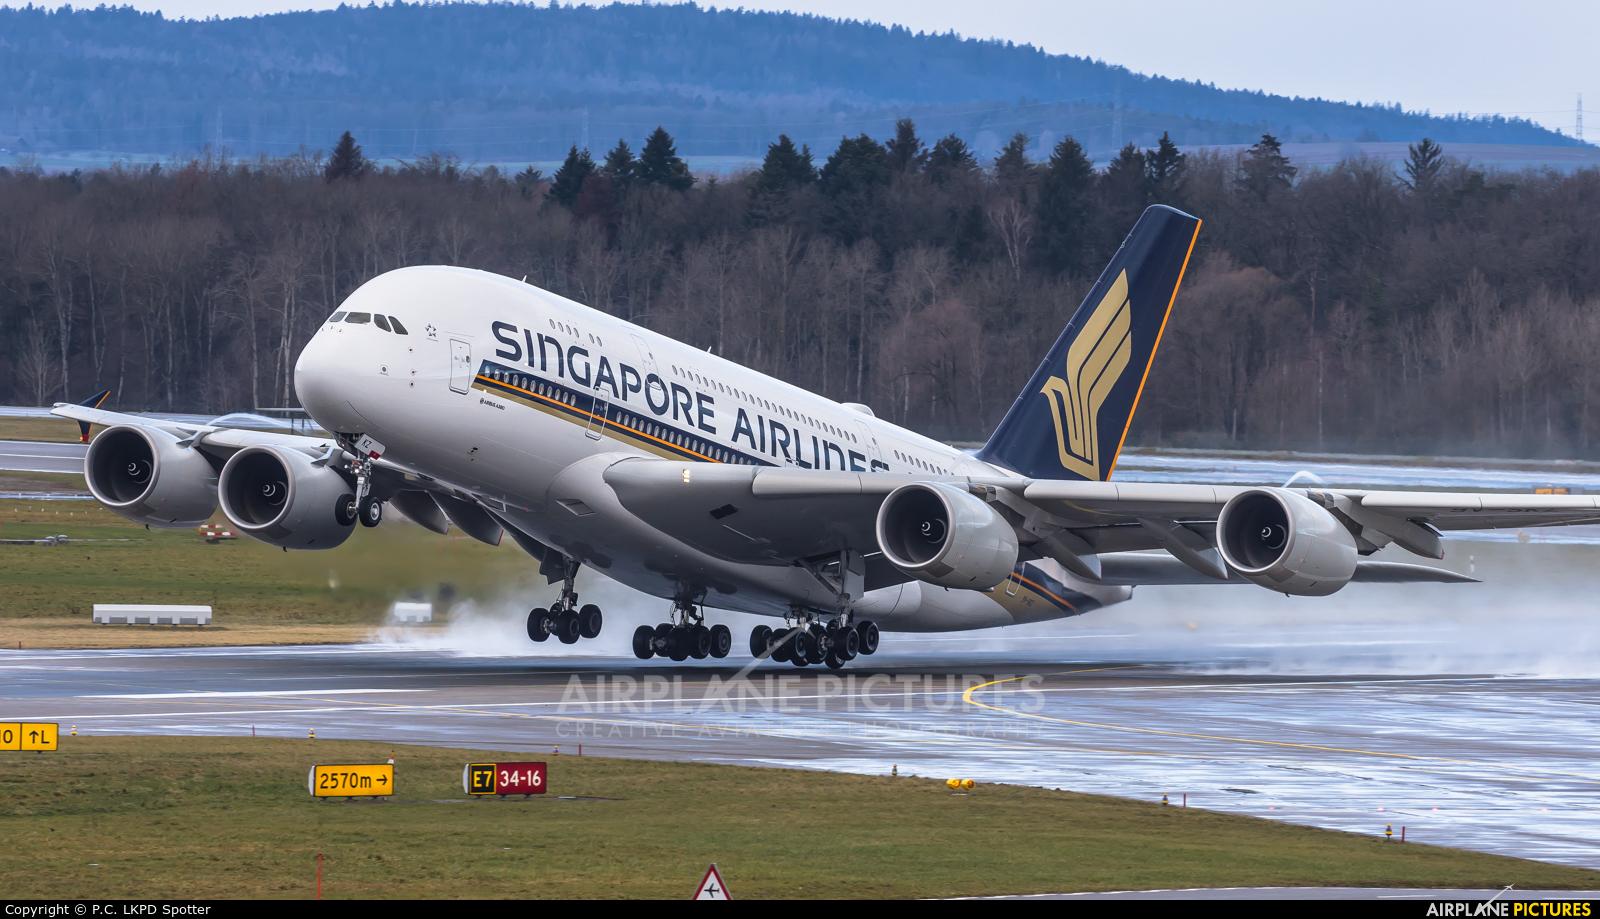 Singapore Airlines 9V-SKZ aircraft at Zurich